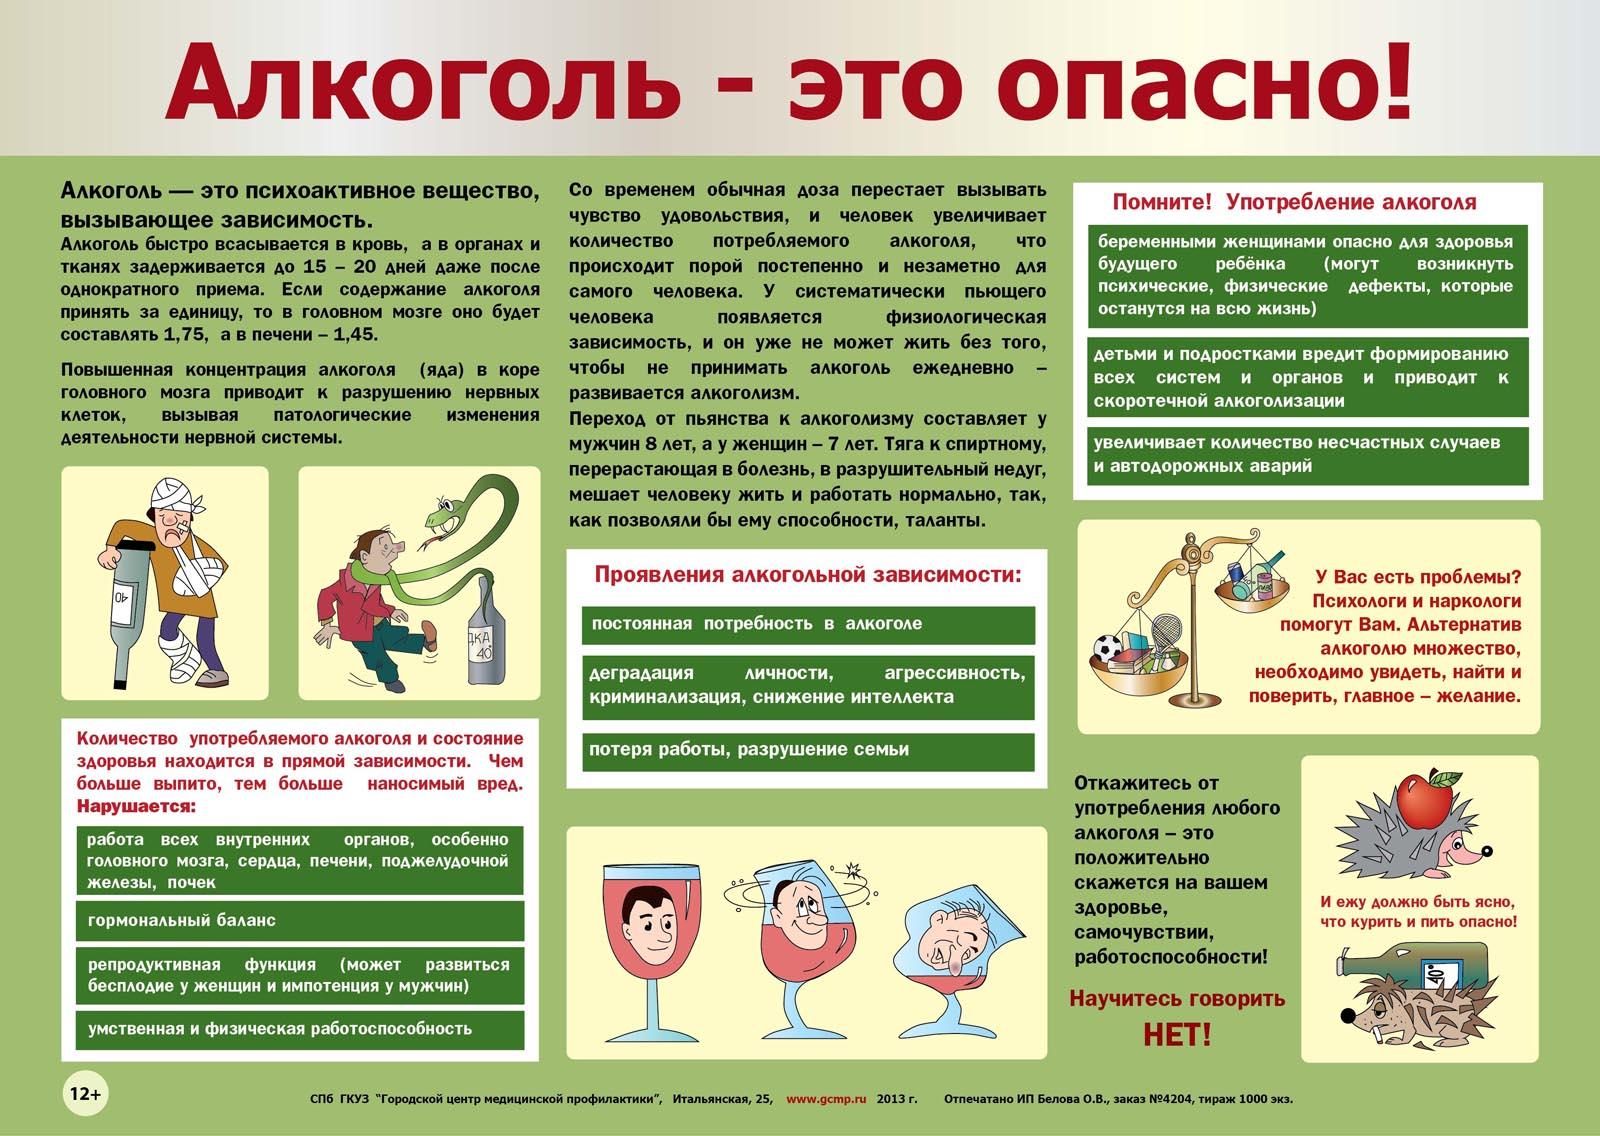 Шпаргалка профилактика алкоголизма и наркомании